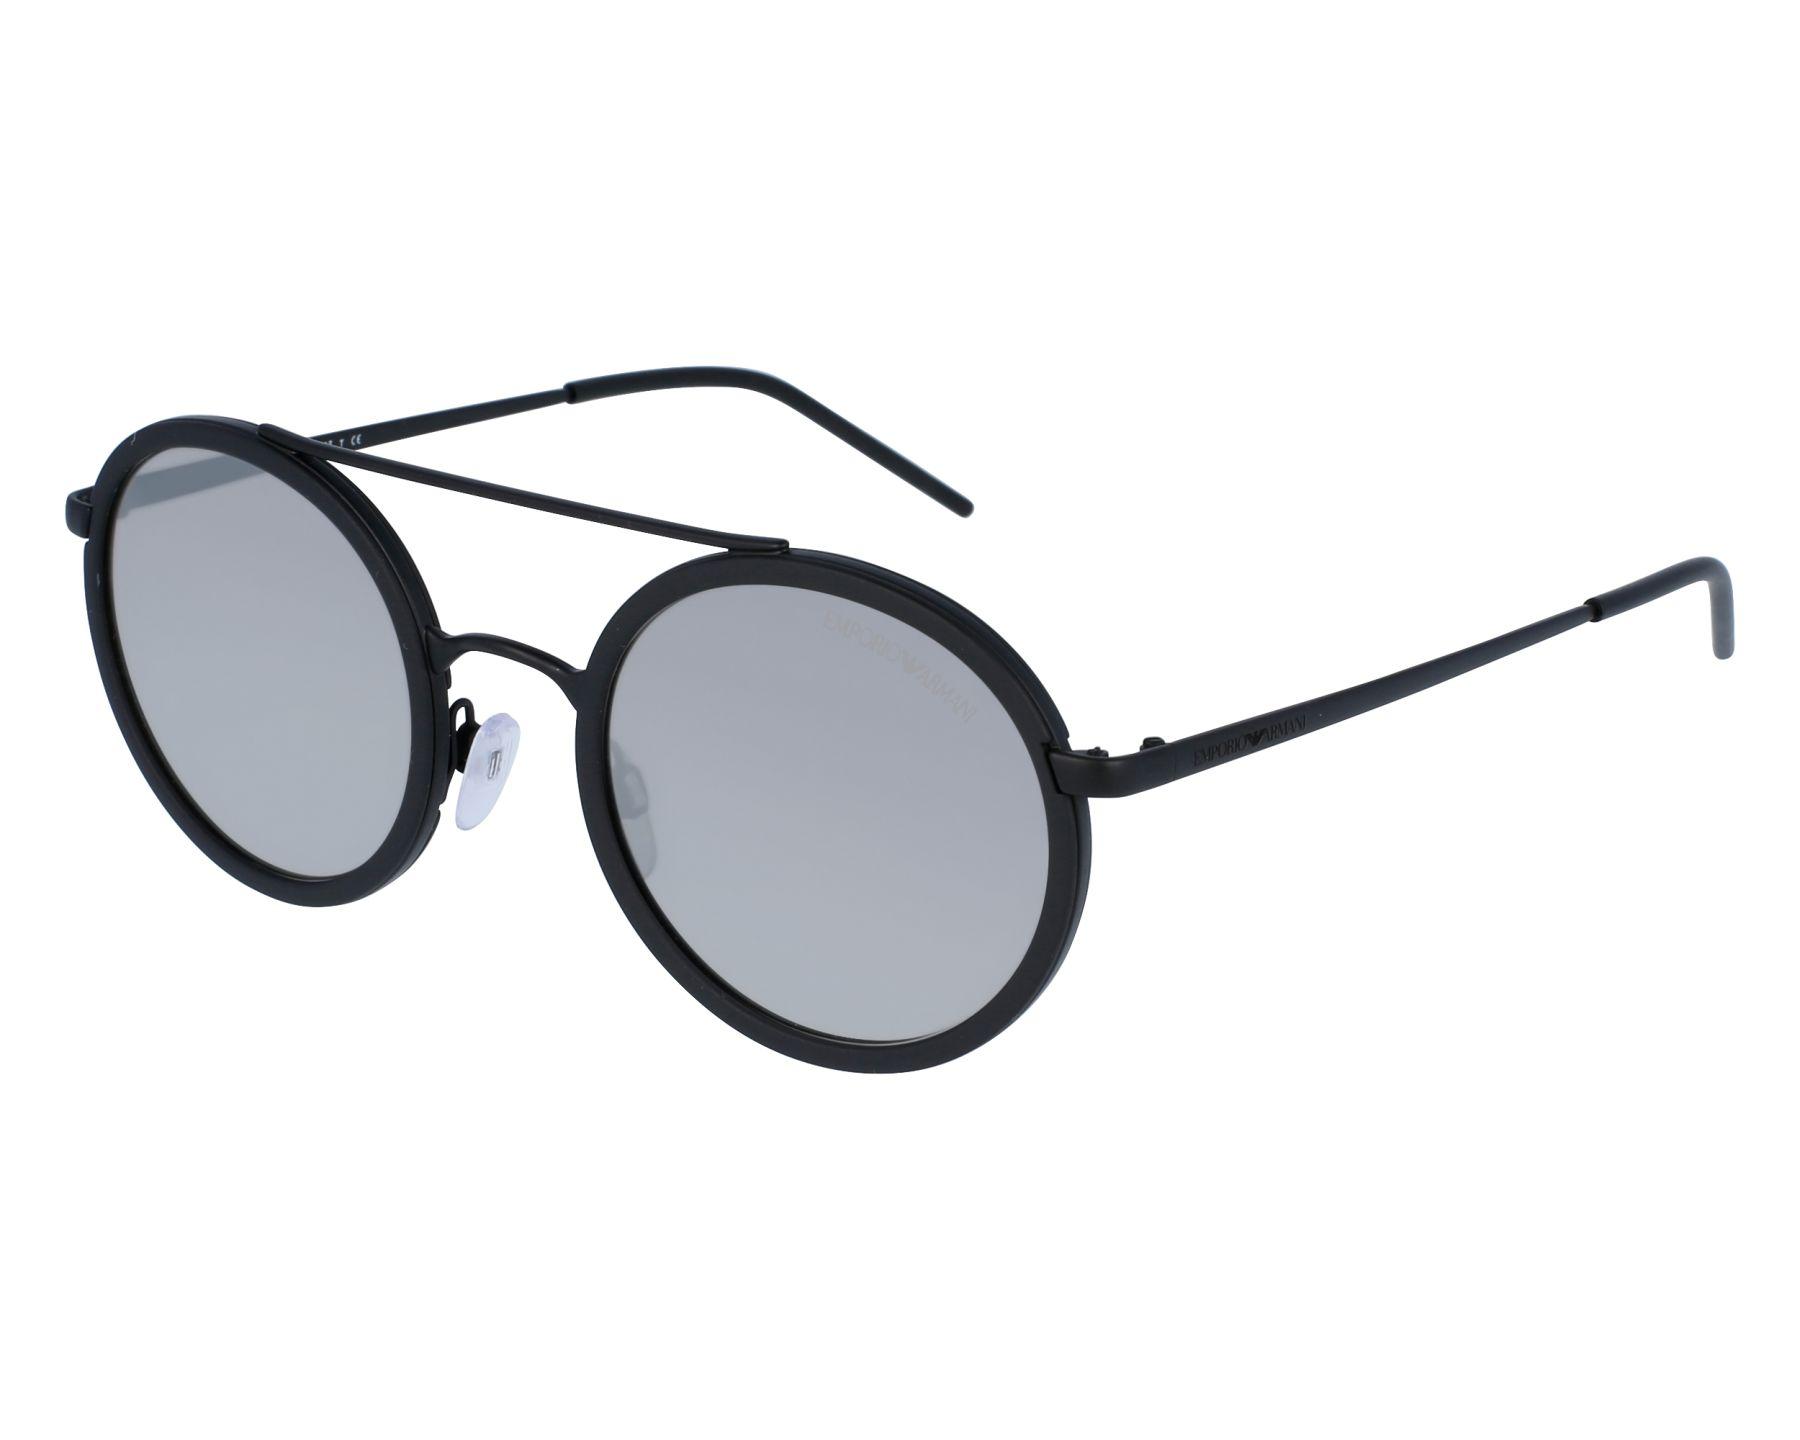 732649a13d7 Versace Sunglasses Model 2041 - Bitterroot Public Library